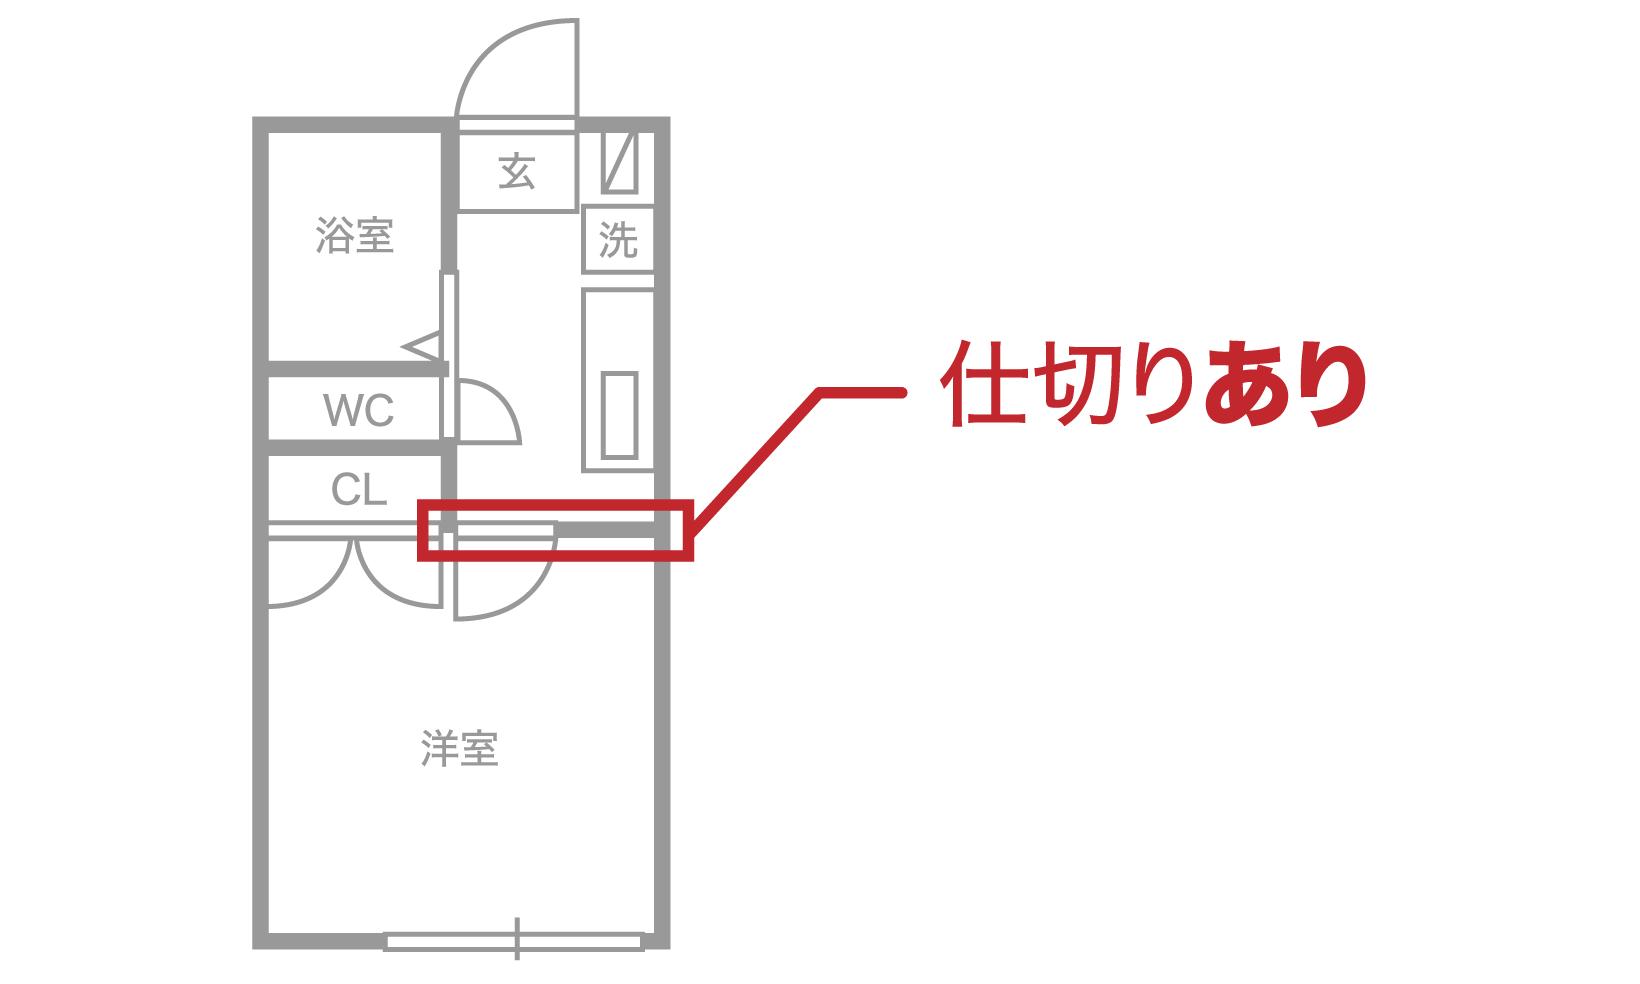 1Kとは、部屋とキッチンが扉で仕切られているタイプの間取りのこと